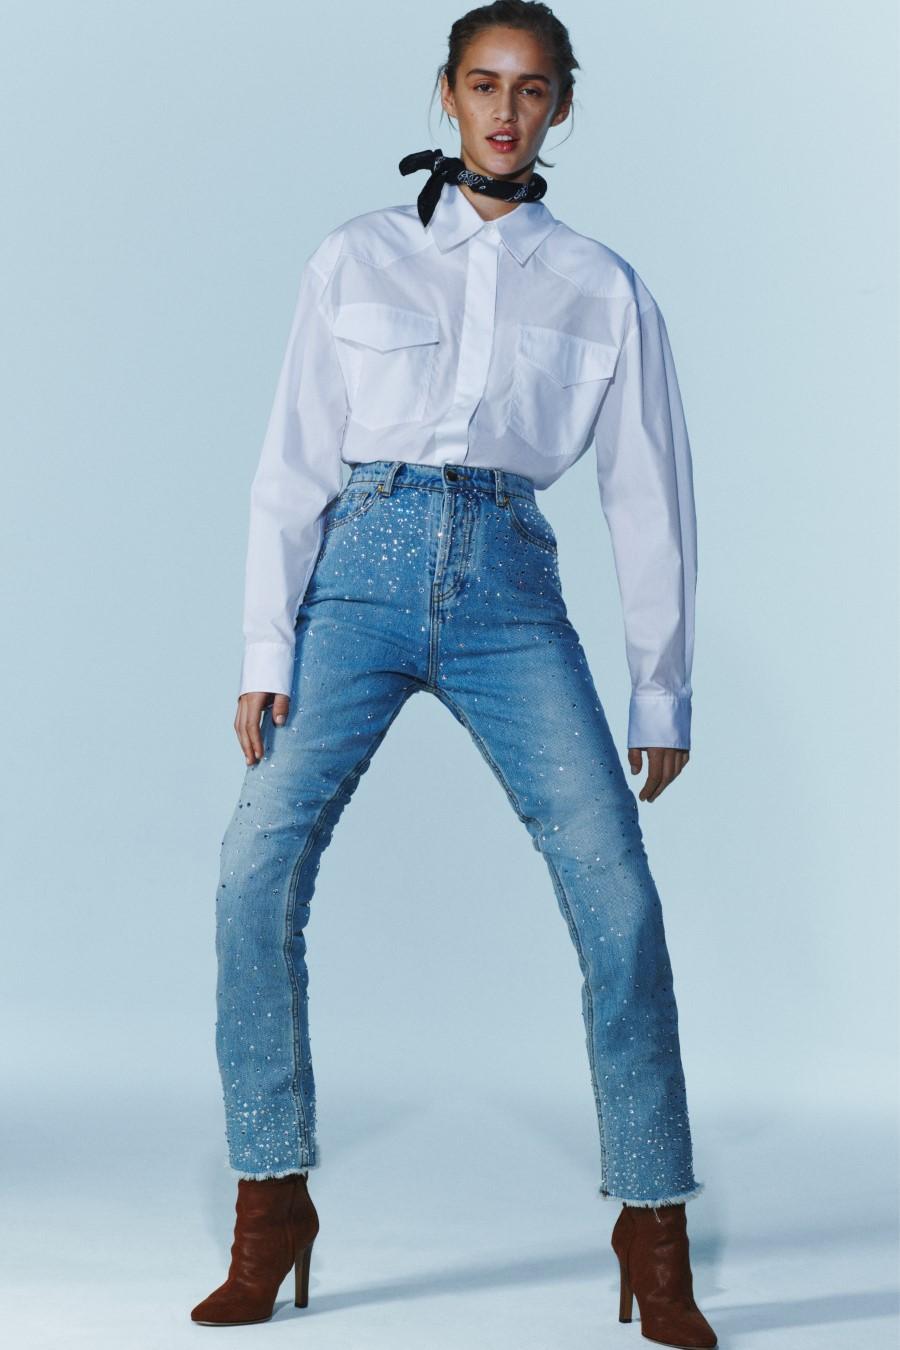 Alexandre Vauthier Fall Winter 2021 - Paris Fashion Week